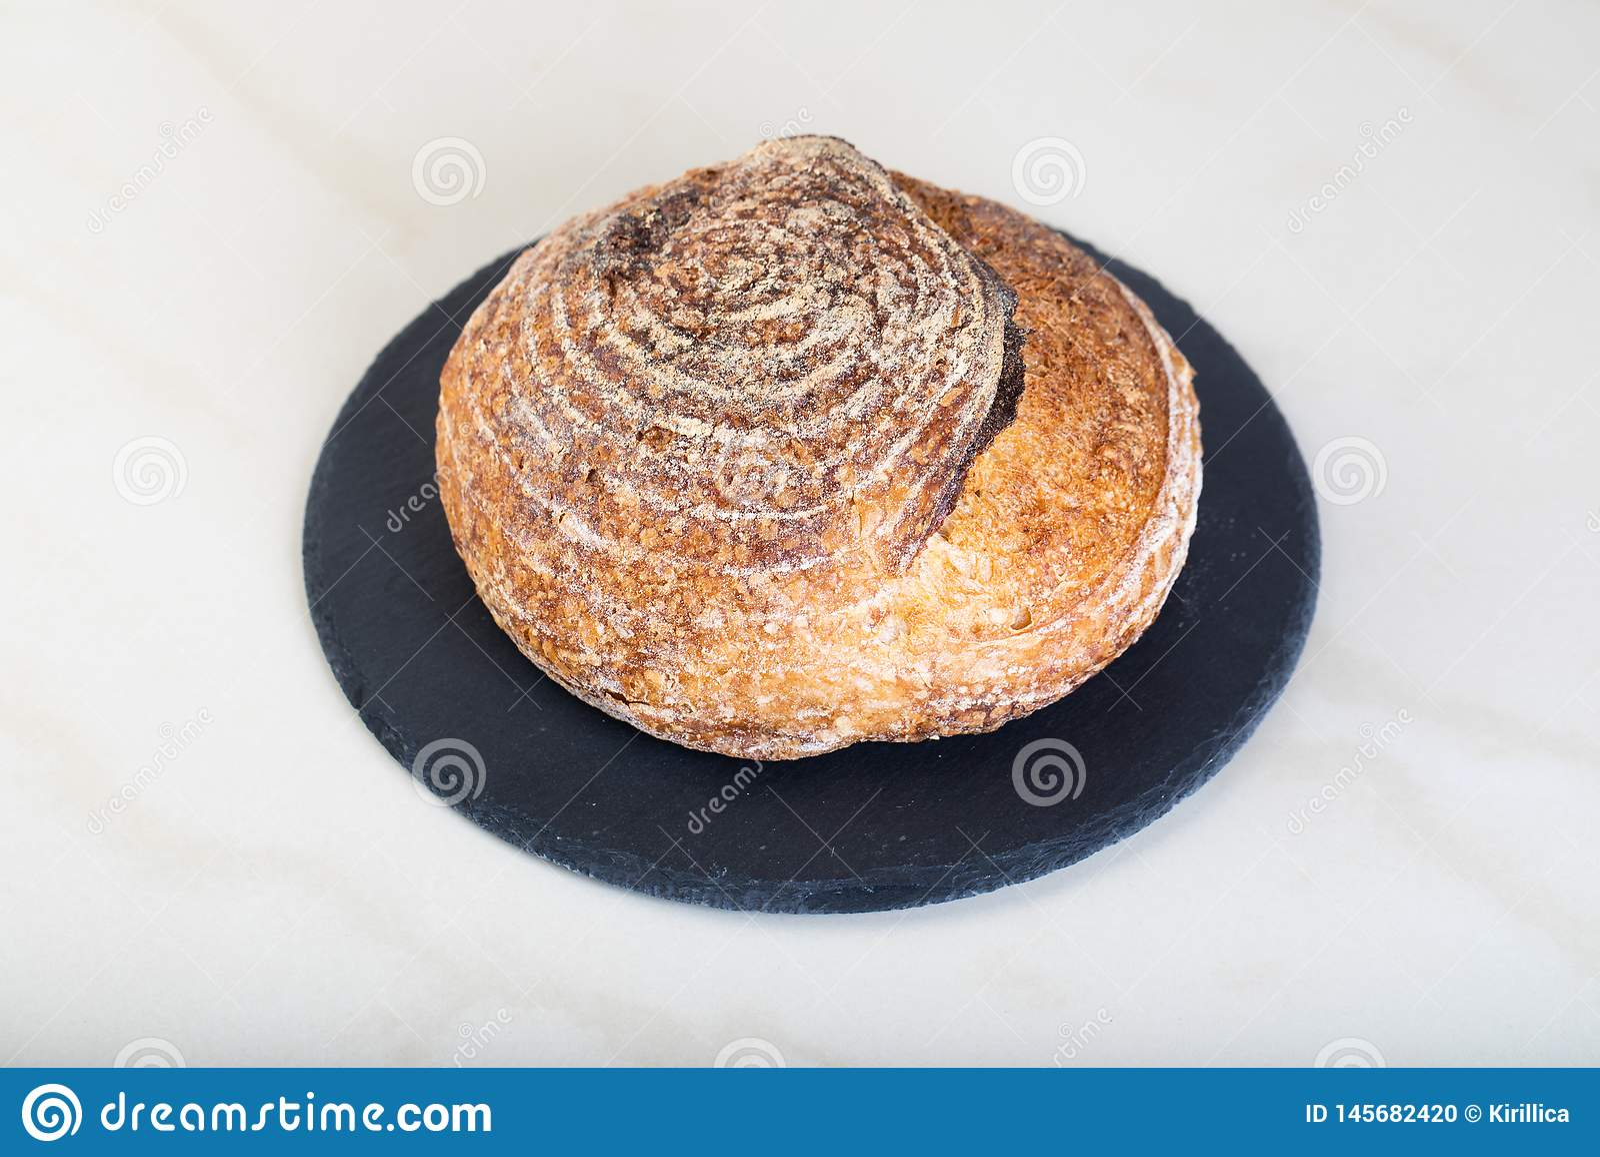 Fresh backed bread